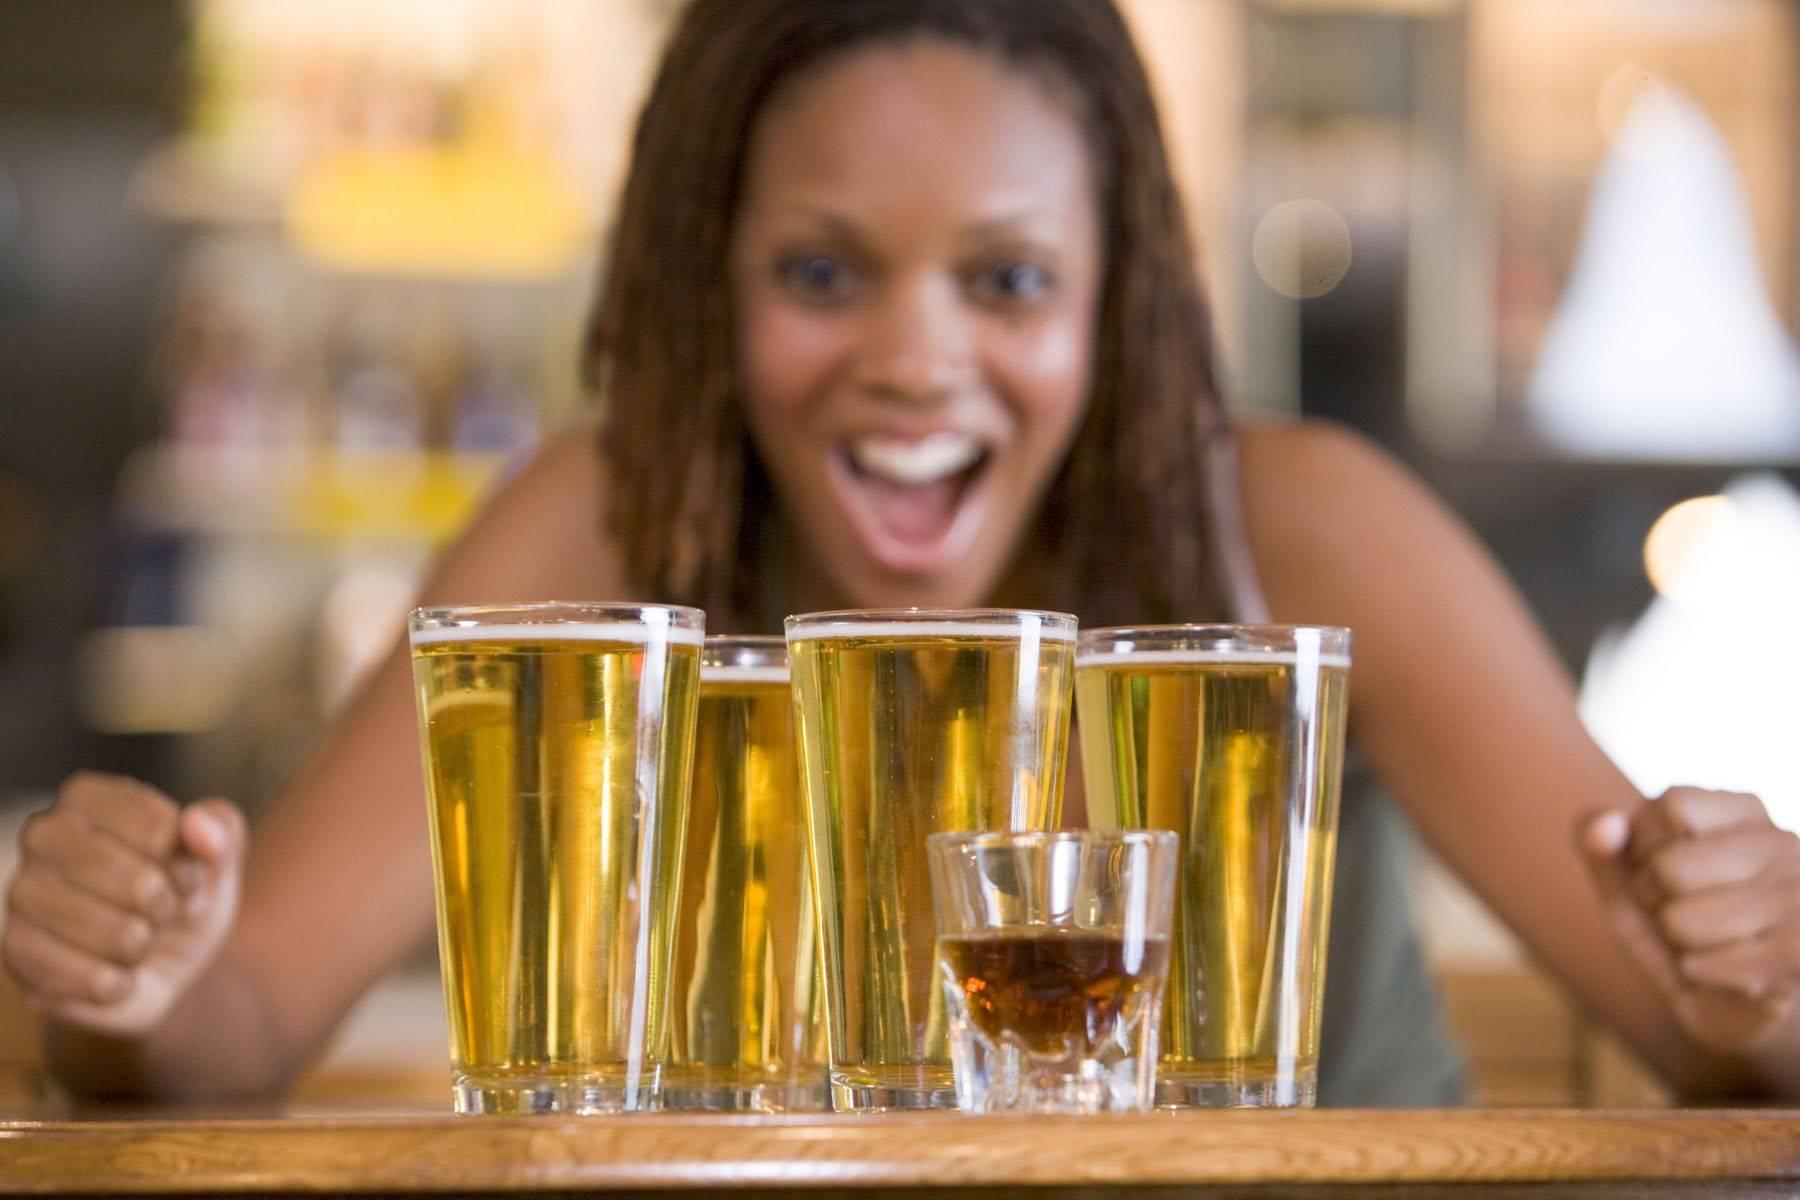 binge drinking on americas campuses